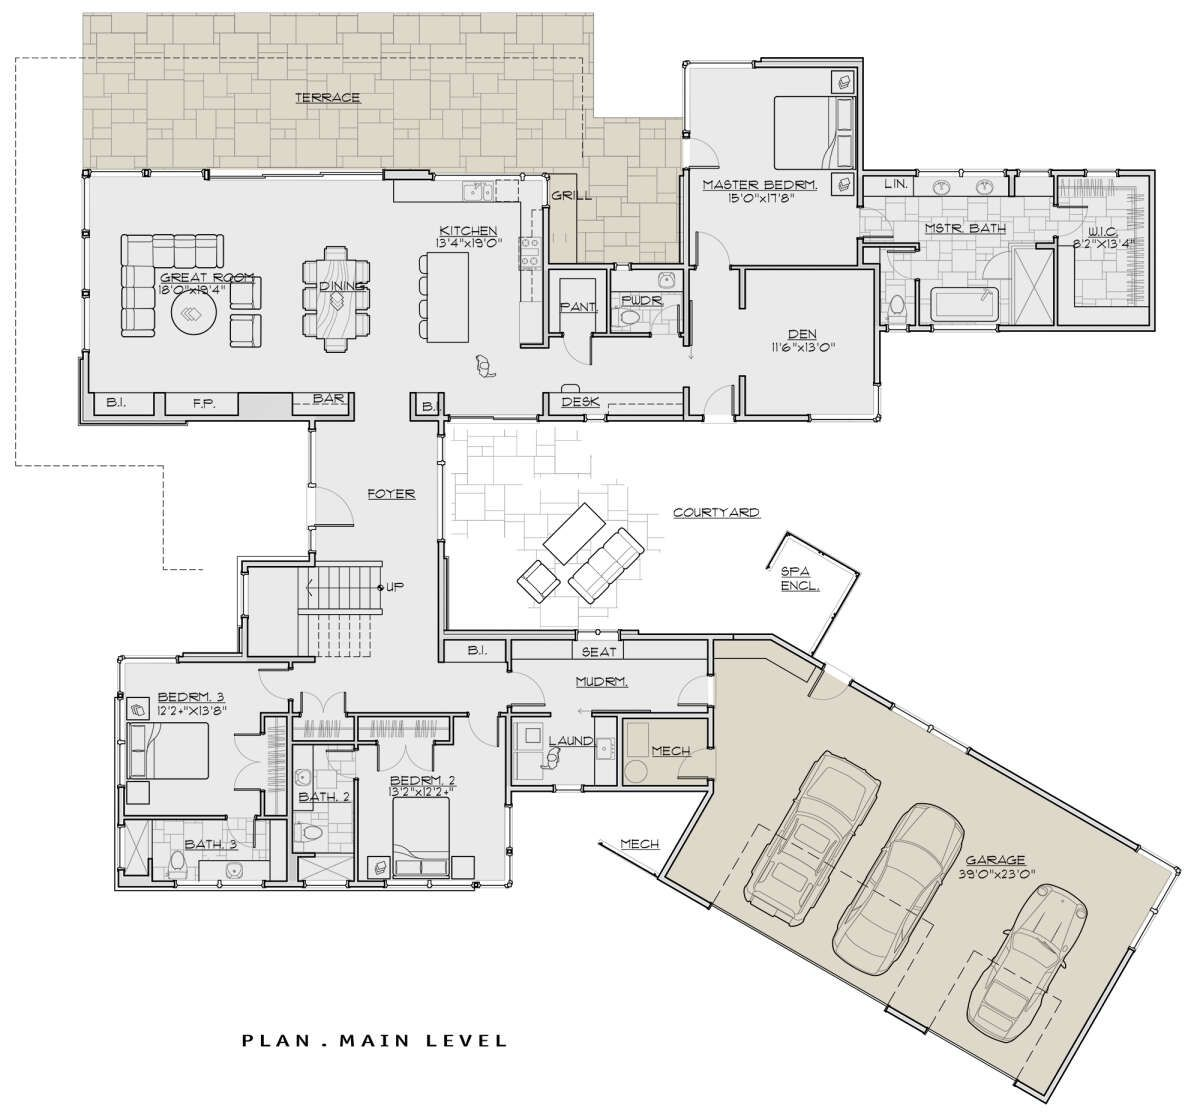 House Plan 5829 00031 Contemporary Plan 3 837 Square Feet 4 Bedrooms 4 5 Bathrooms House Plans How To Plan Square Feet